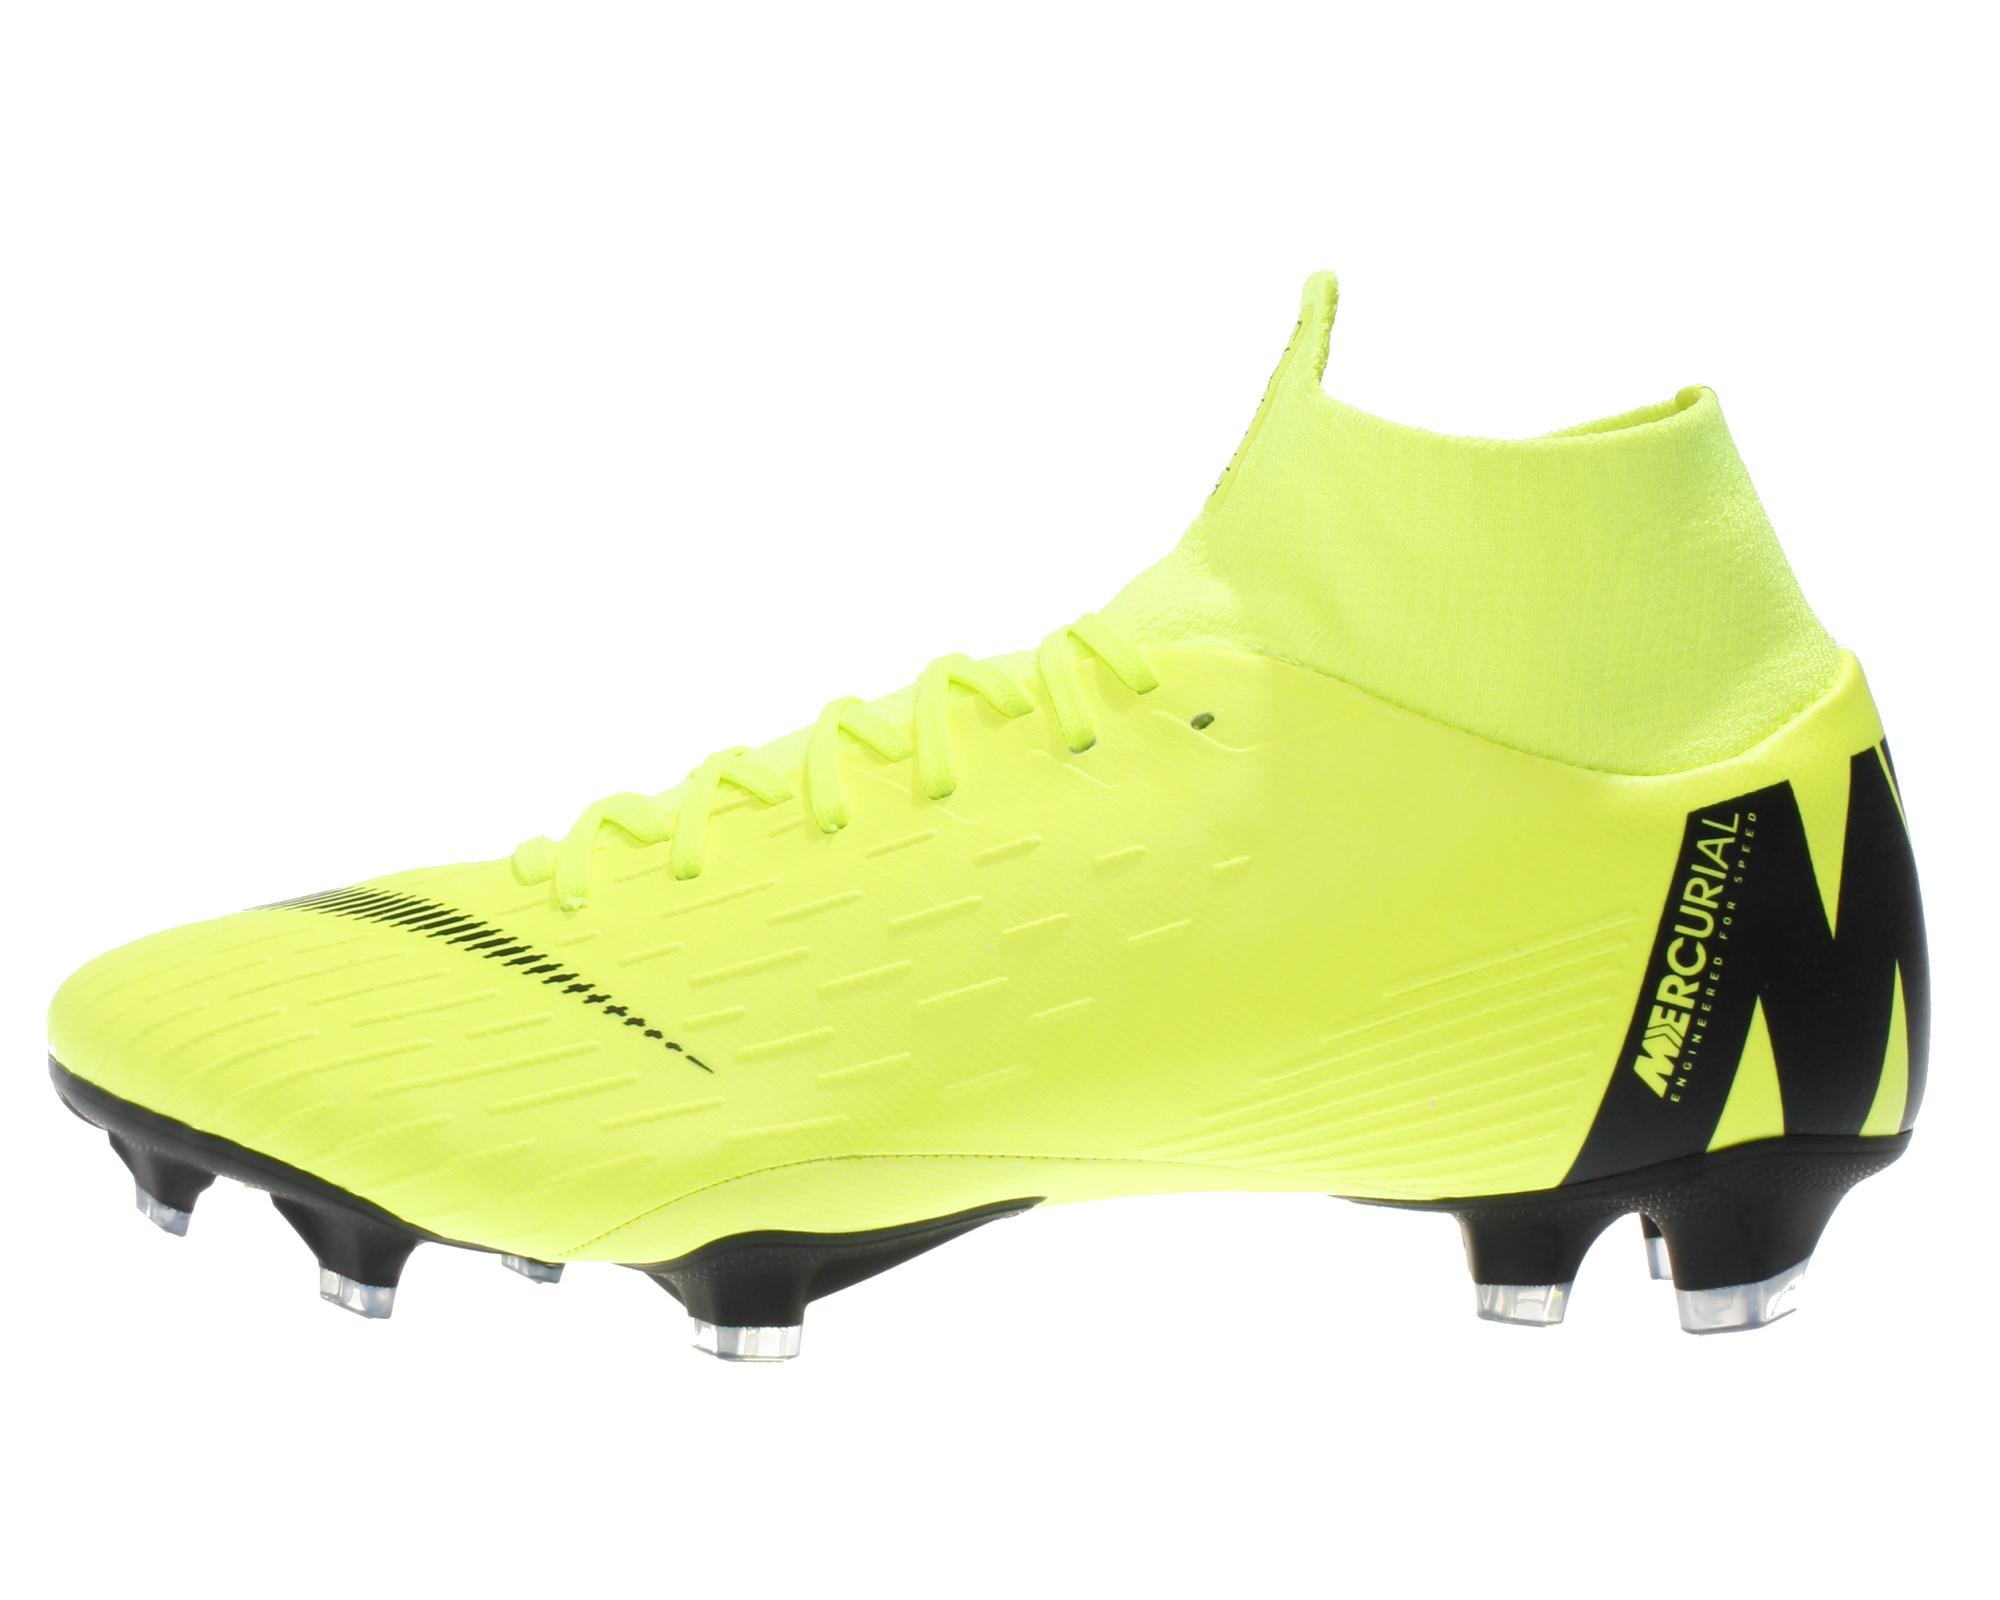 Nike Details Männer NEU Mercurial Schuhe PRO FG gelb Herren Fußball VI zu Superfly Rasen N80wPymvnO